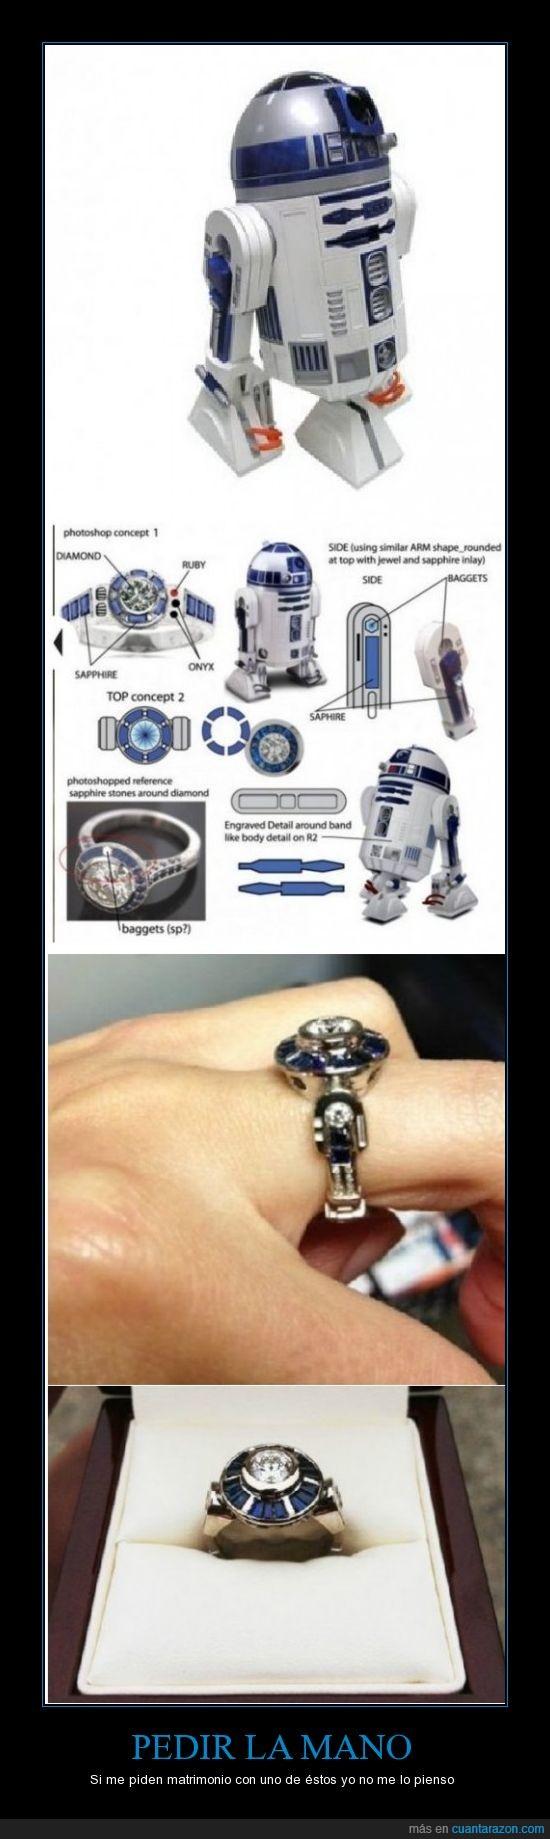 anillo,compromiso,friki,matrimonio,pedida,r2d2,star wars